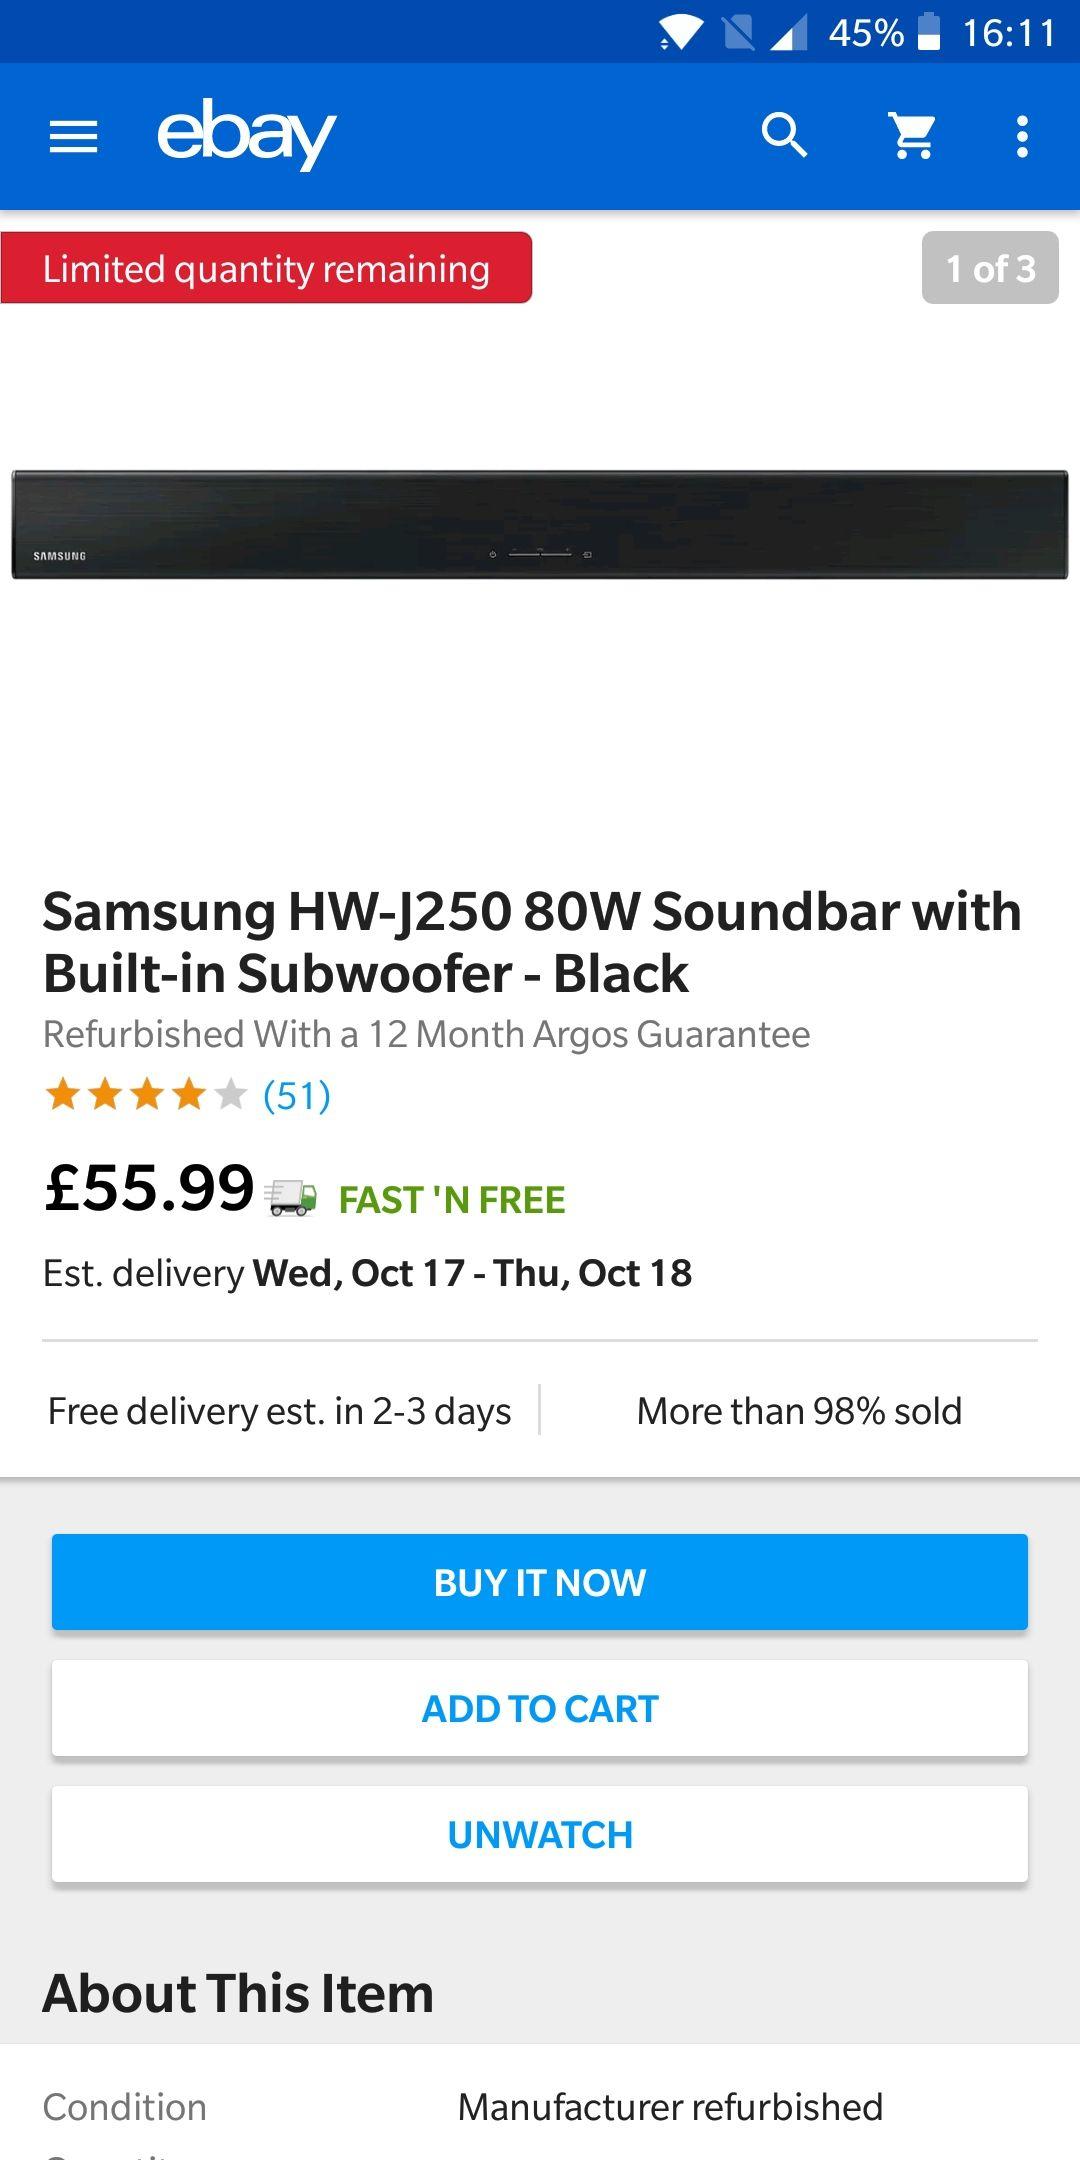 Samsung HW-J250 80W Soundbar with Built-in Subwoofer Refurbished £55.99 @ Argos Ebay